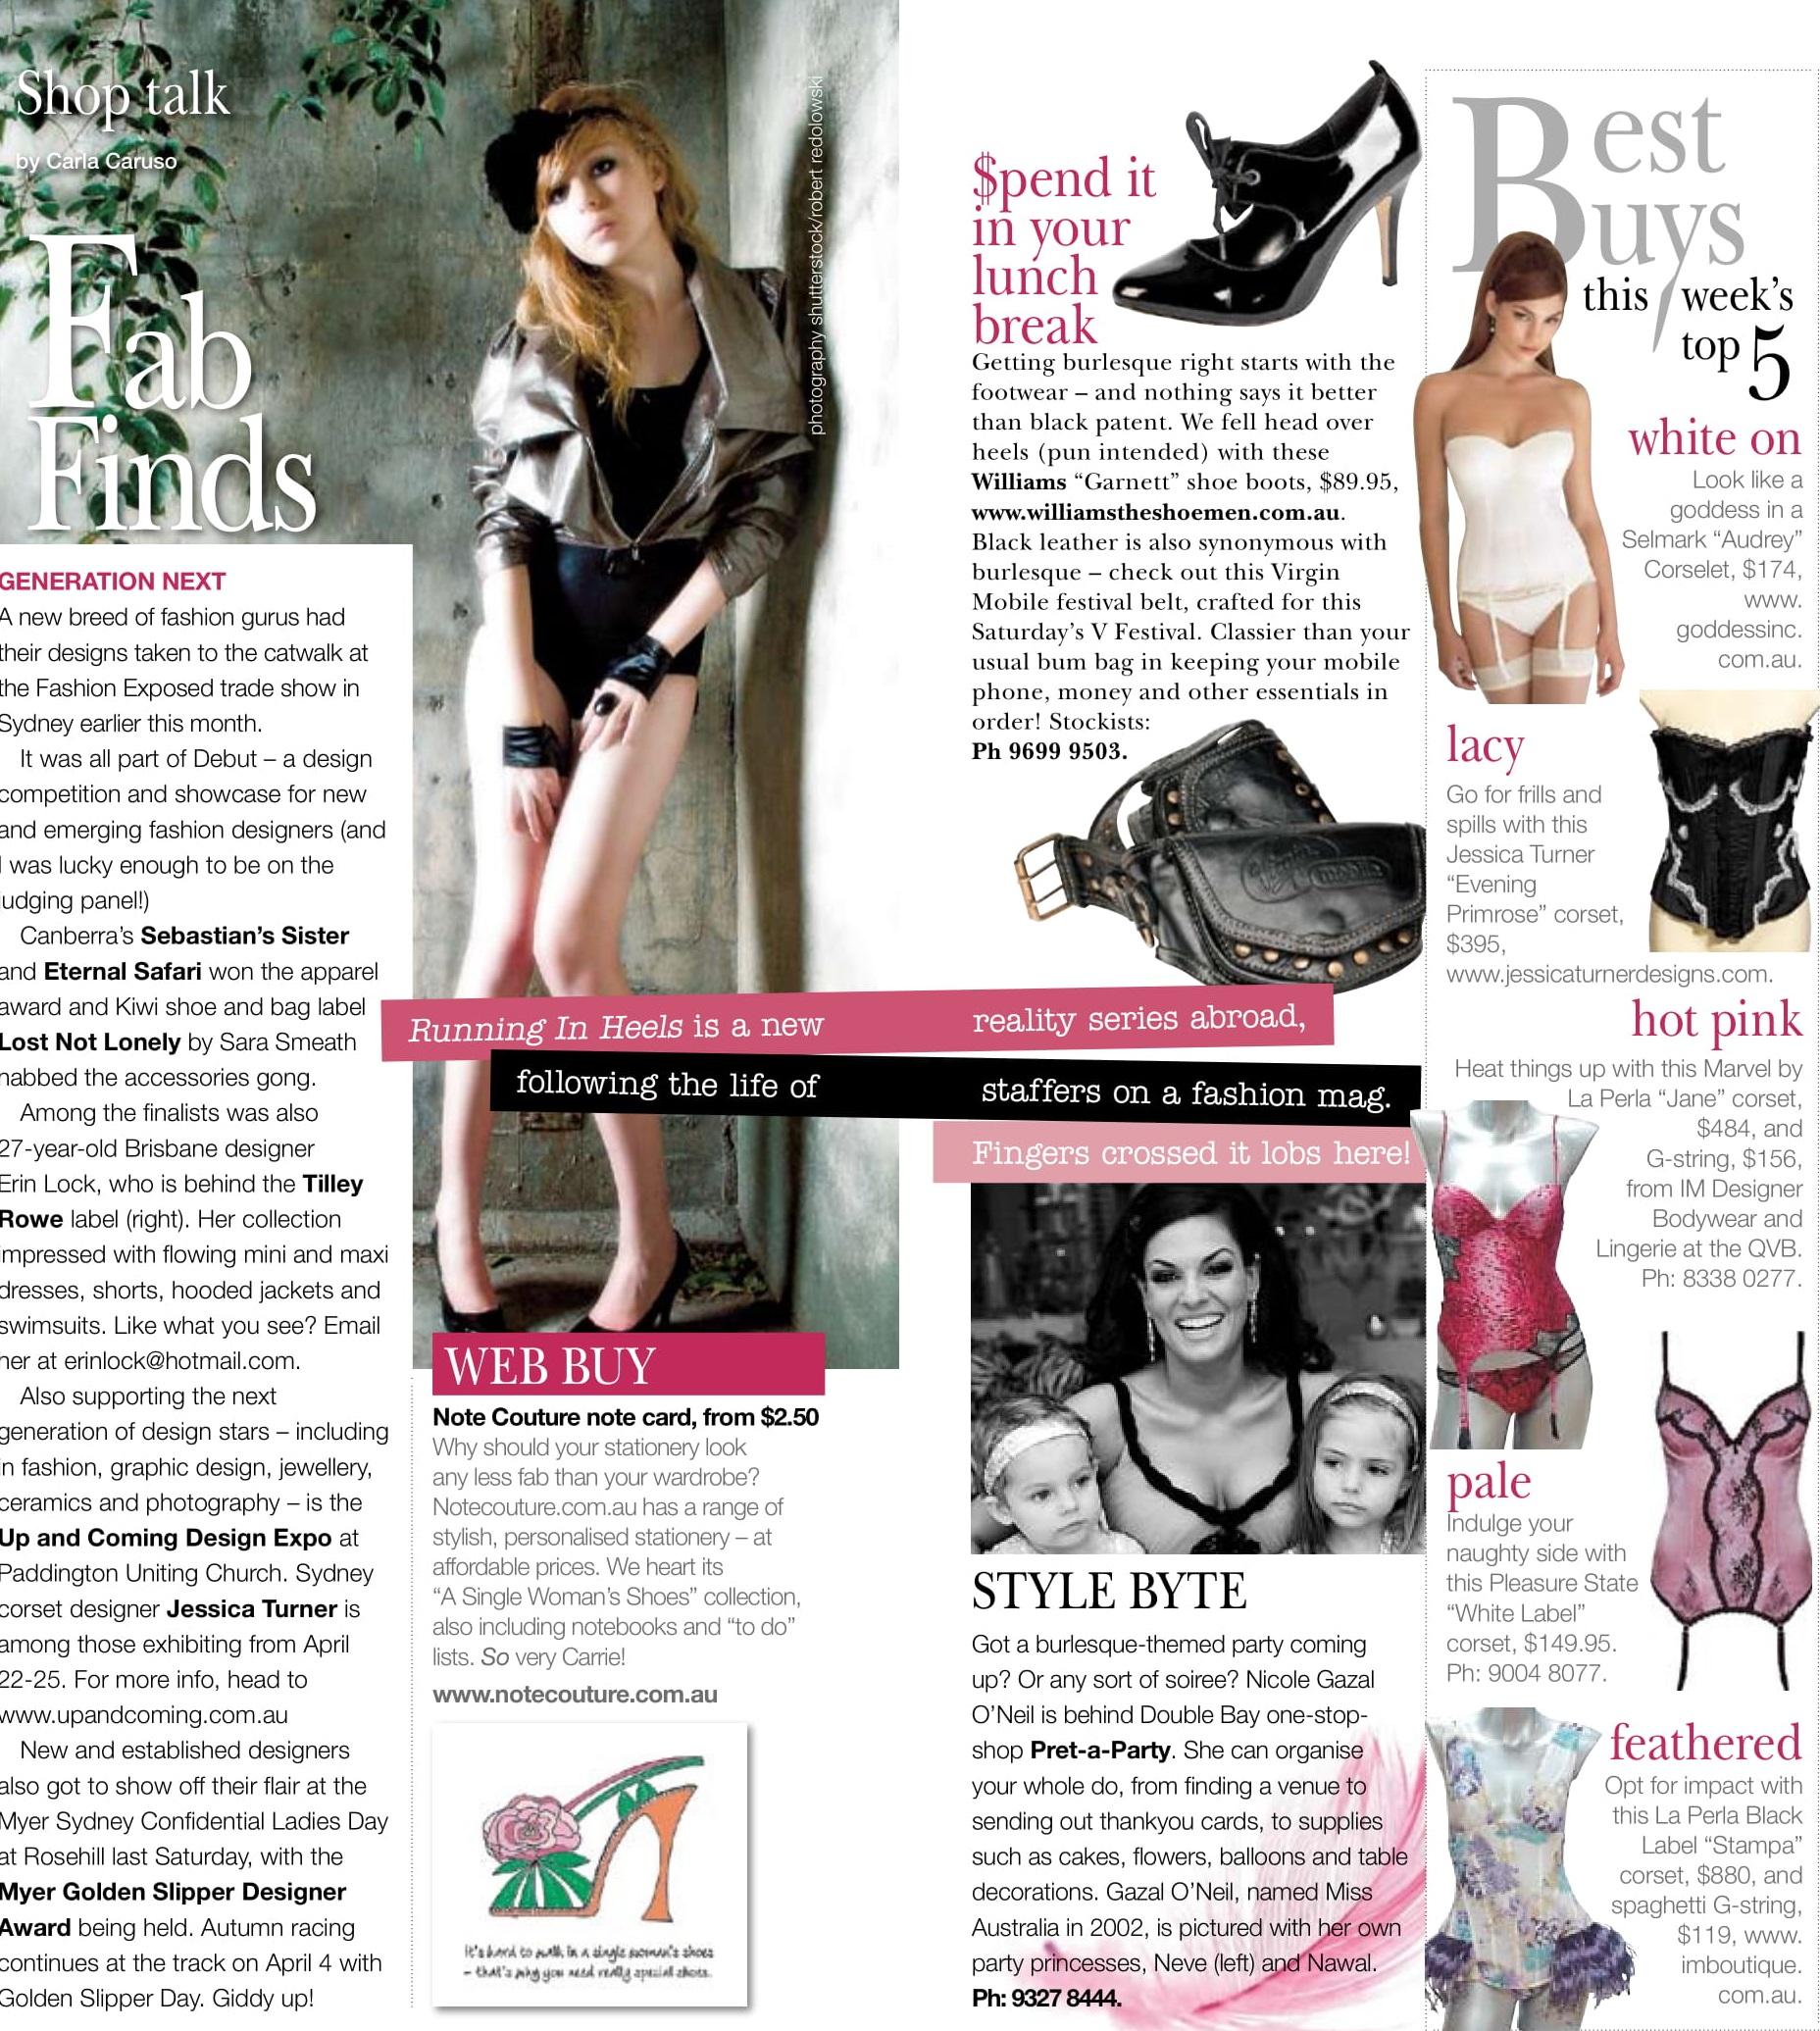 9-5 Shop Talk Magazine